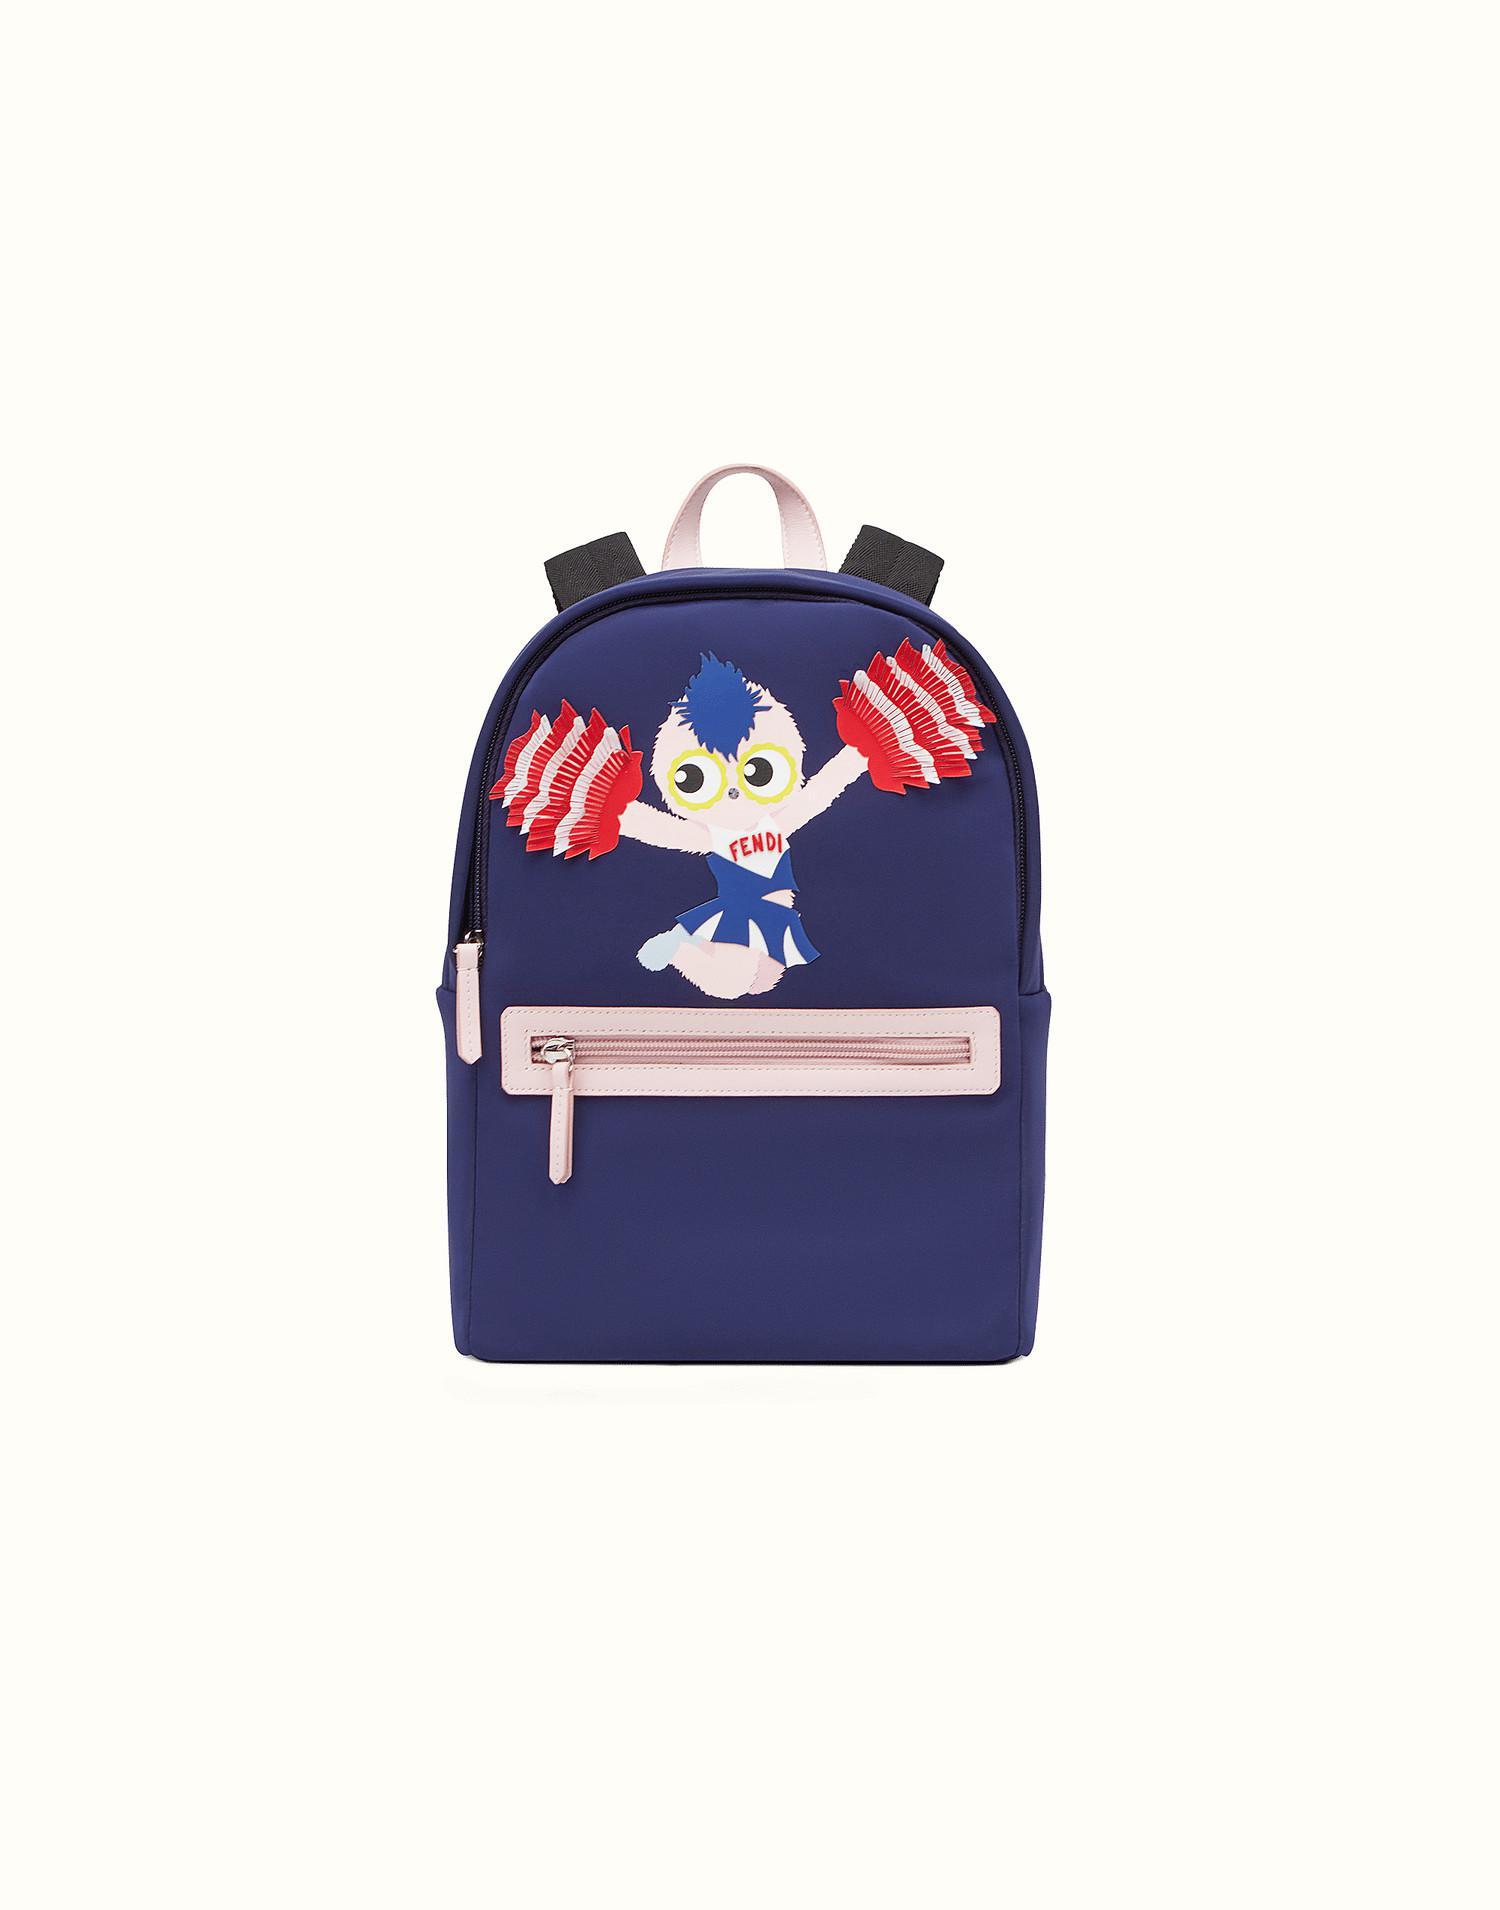 Fendi Baby Backpack Baby Backpack in Blue